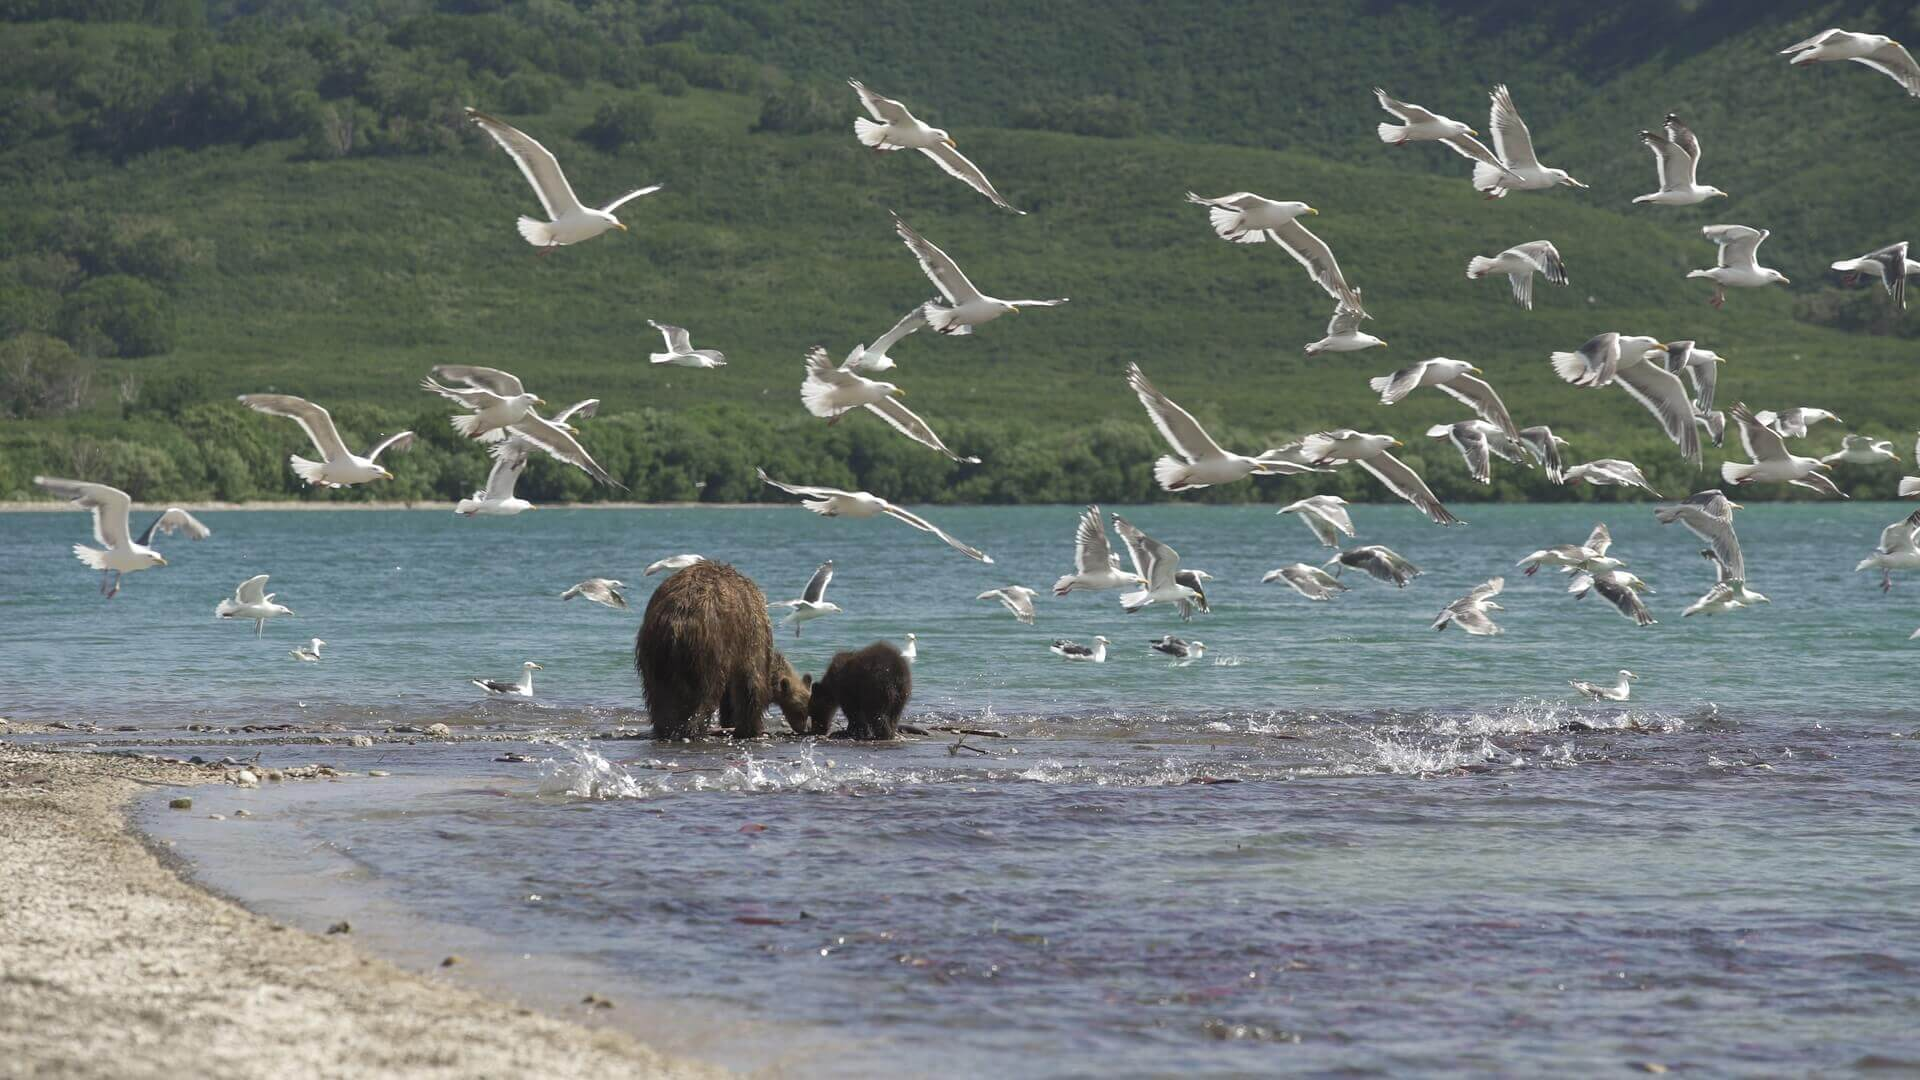 Pelicam Urșii din Kamchatka